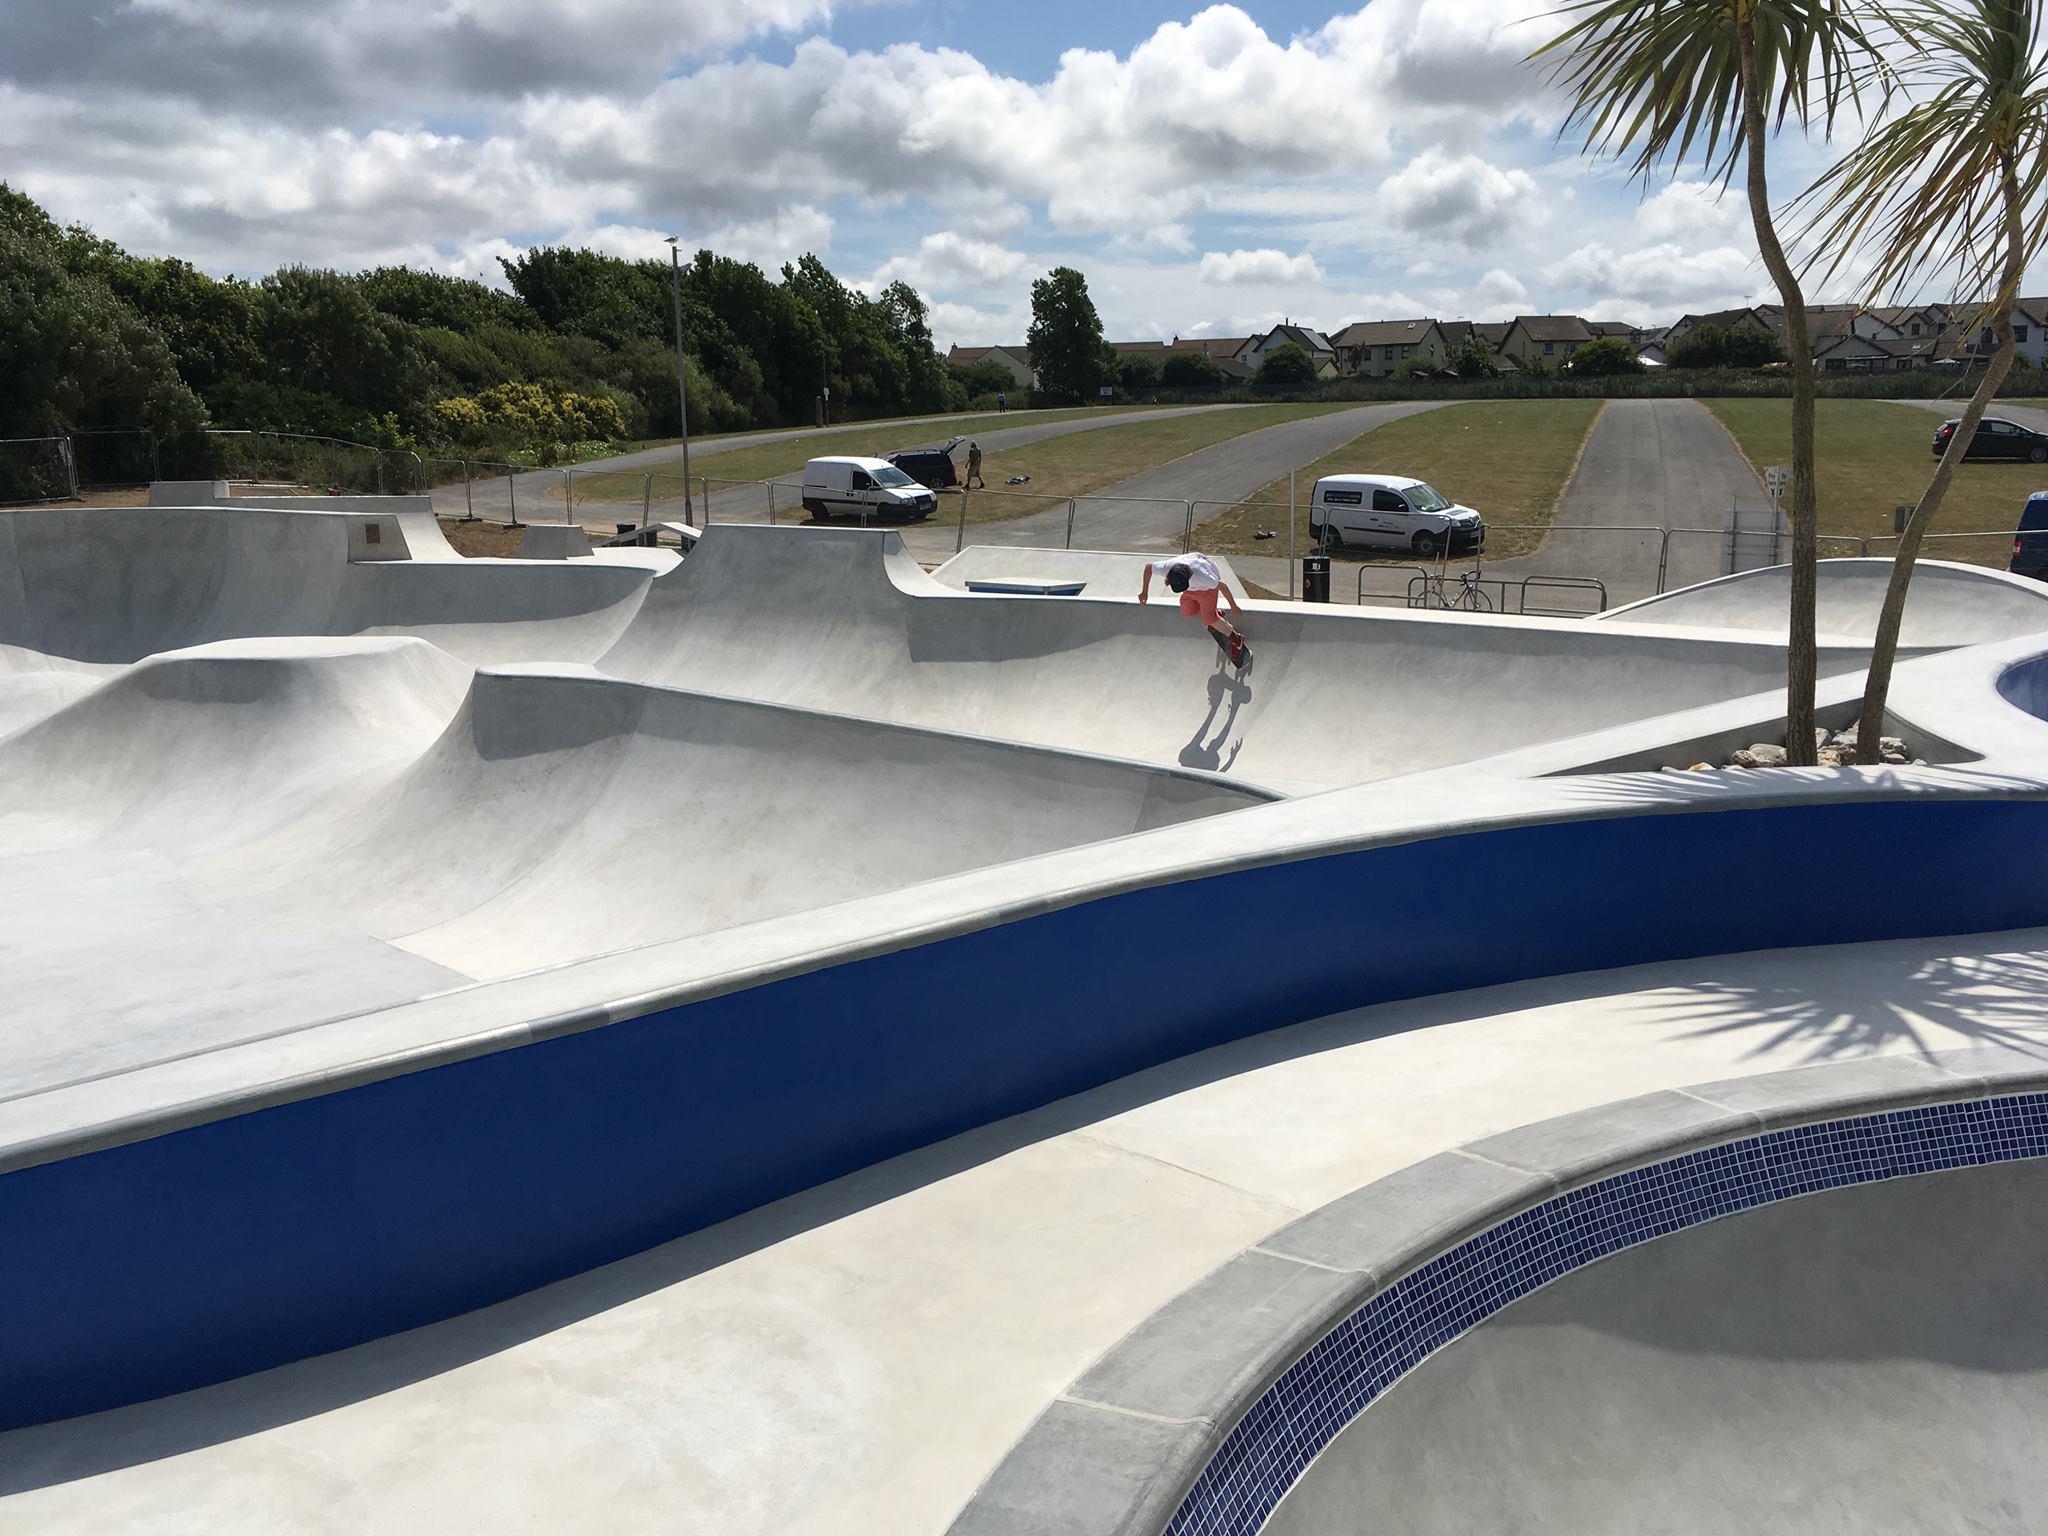 newquay skatepark